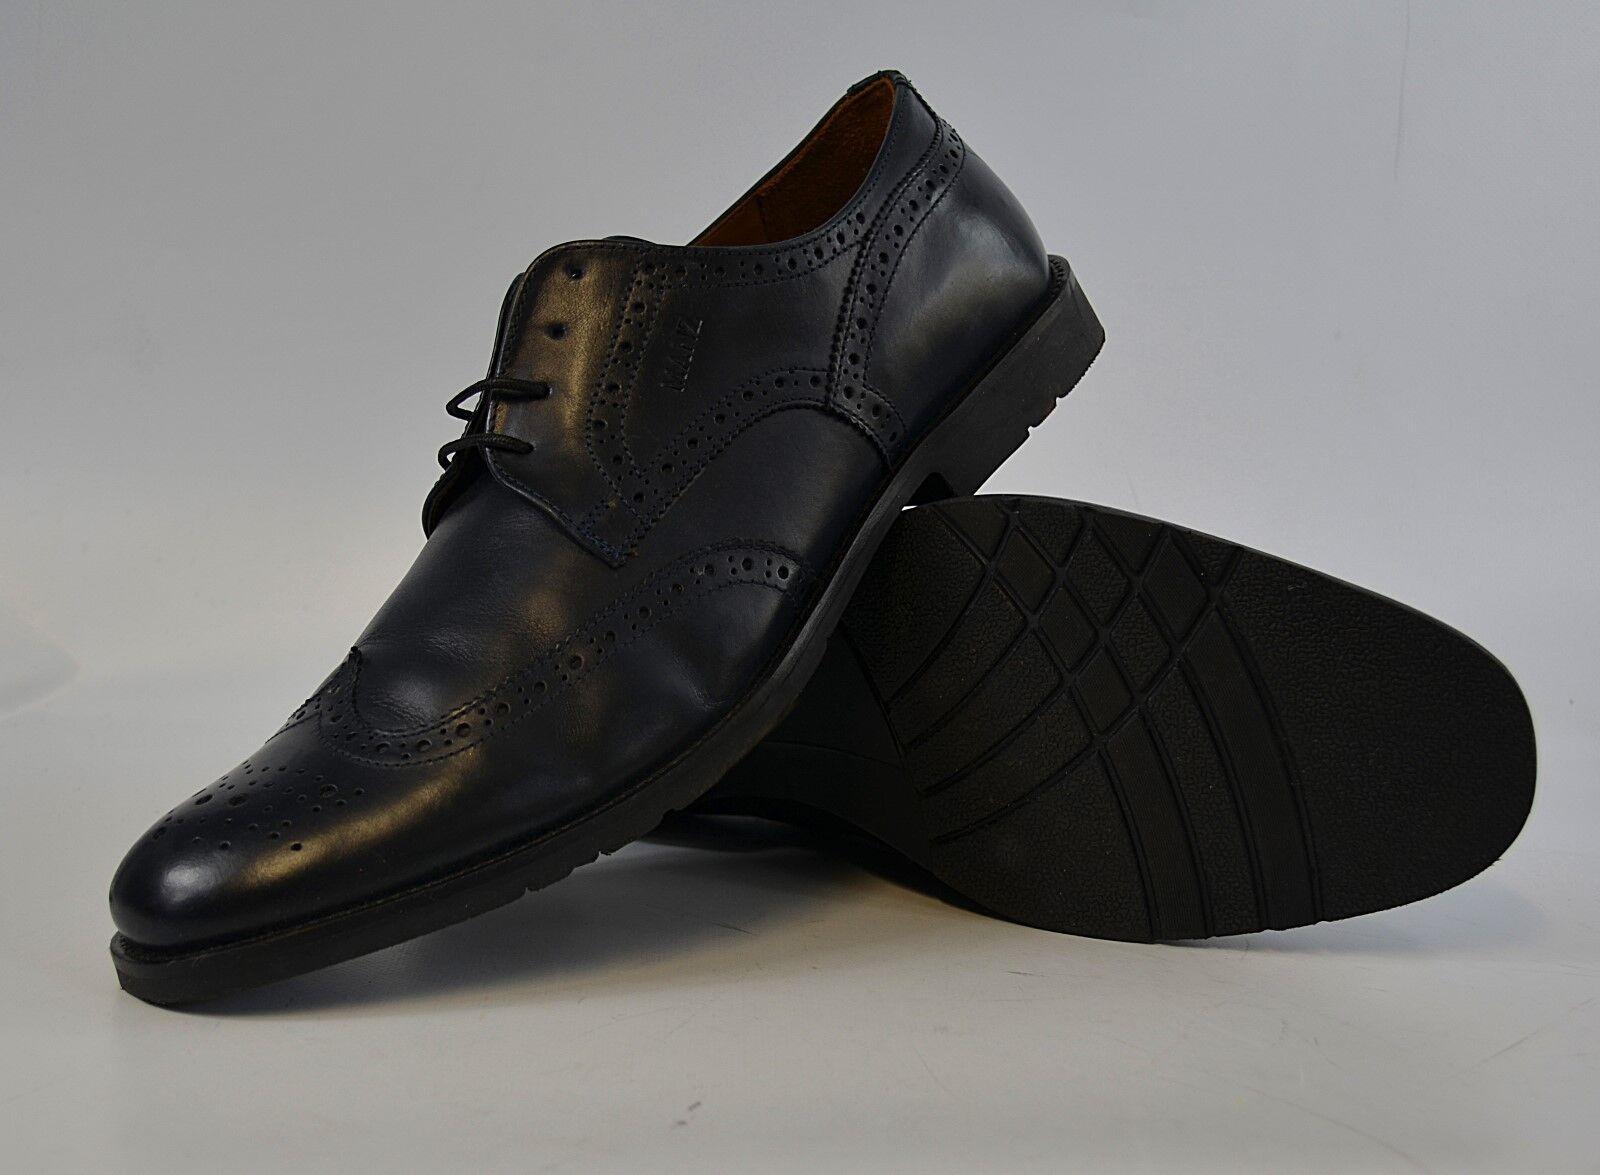 Manz schnürschuhe talla 11 46 cuero, Business zapatos, zapatos caballero 2/18 m2 r8